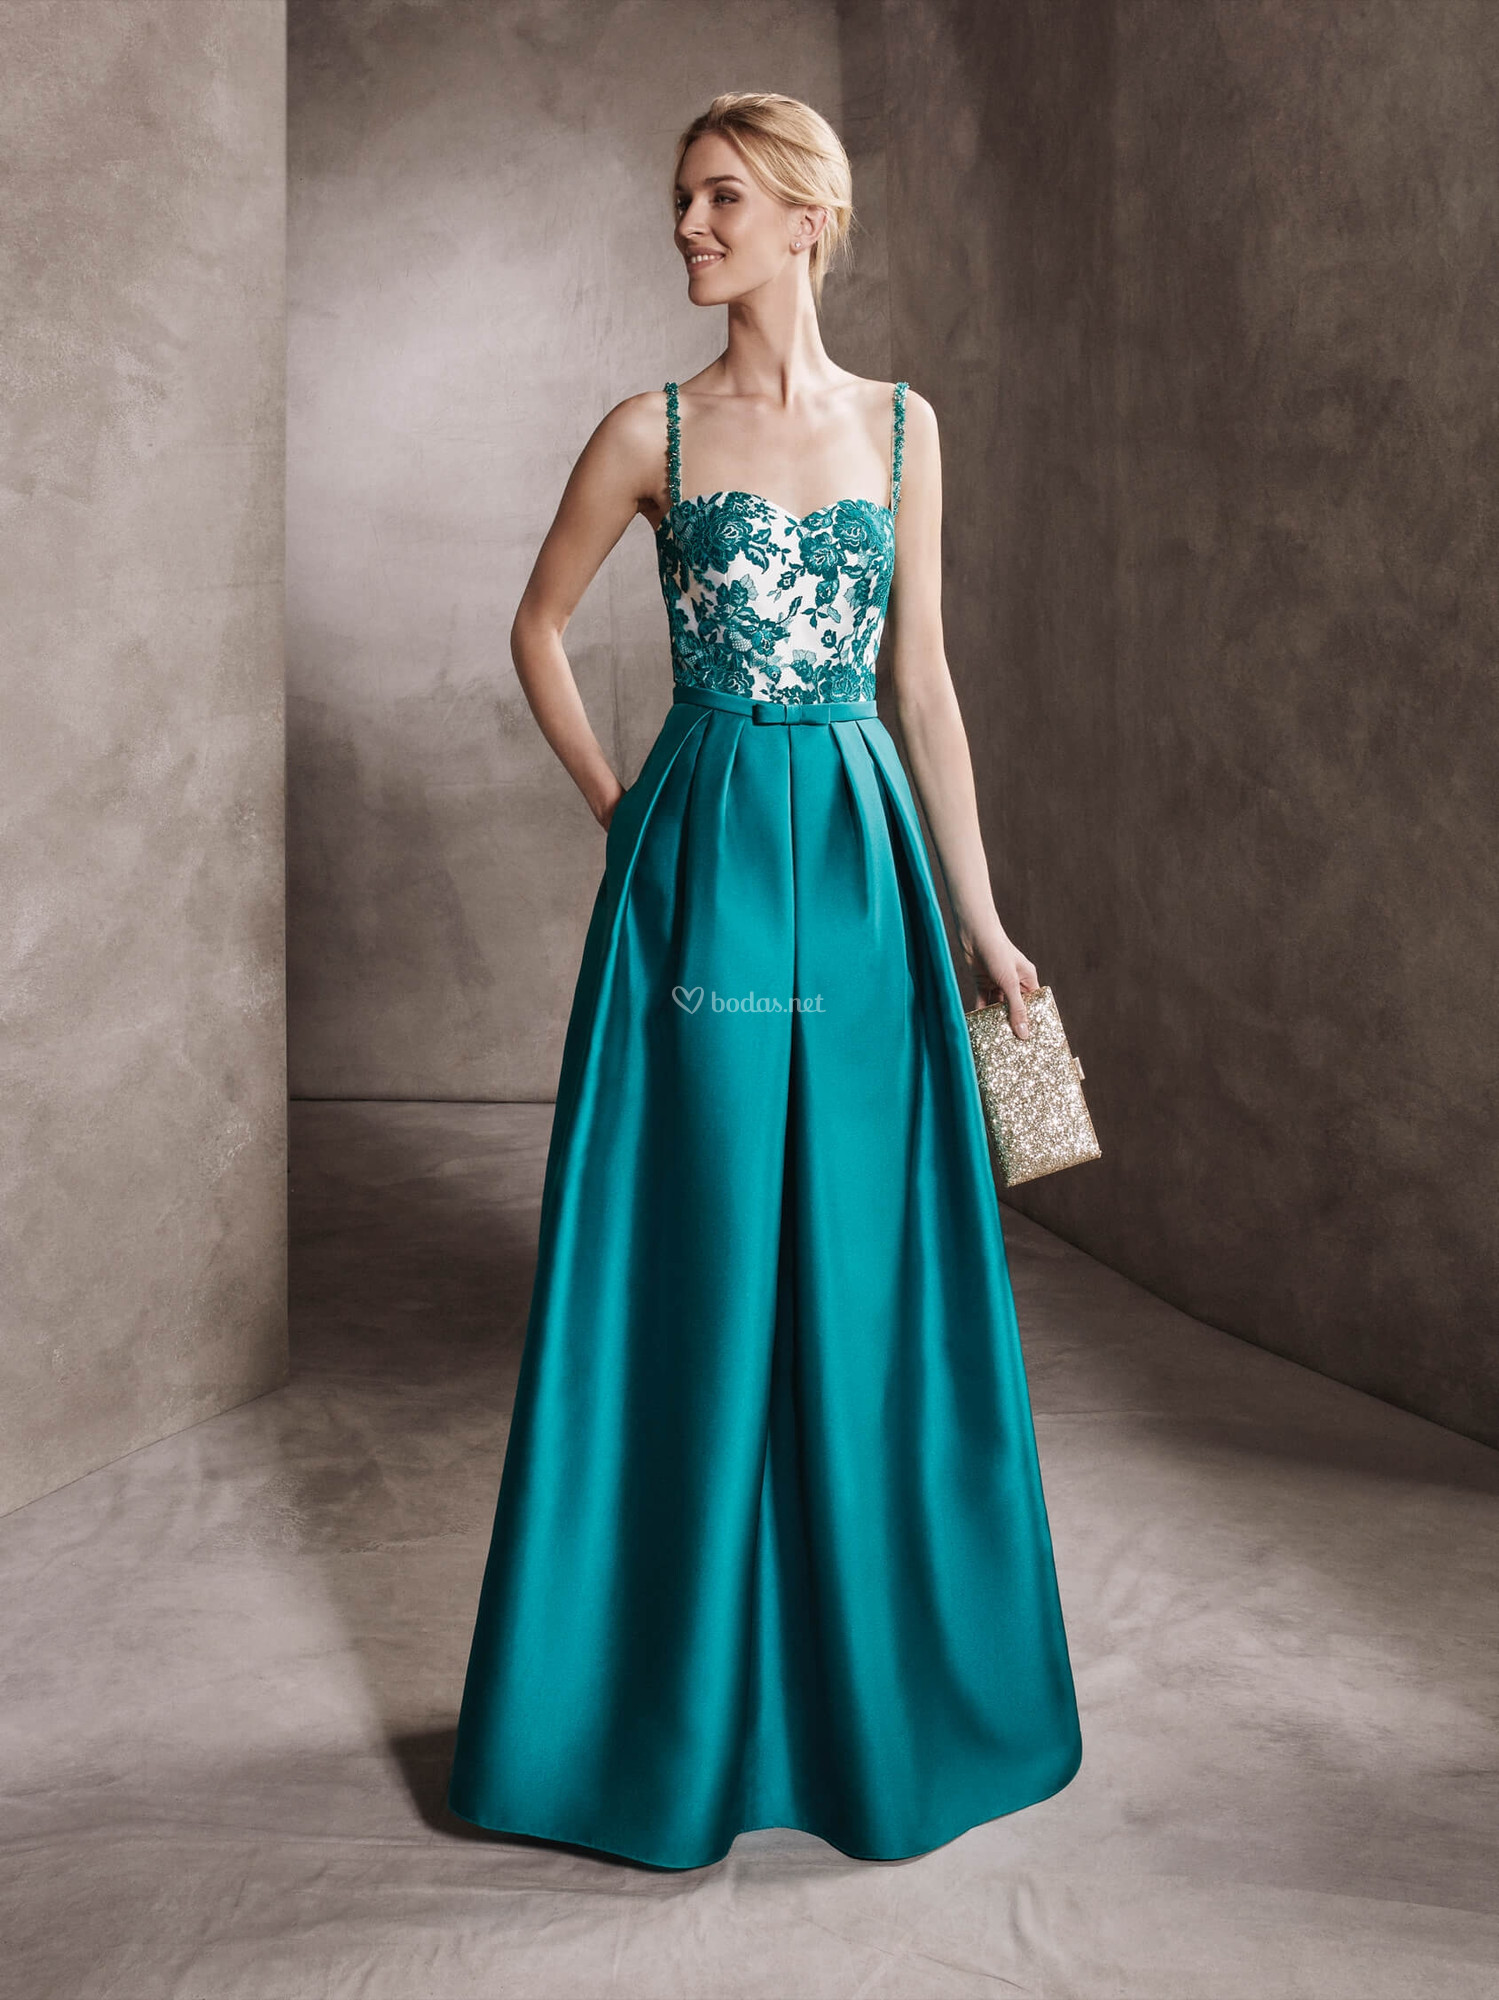 Colorful Adolfo Dominguez Vestidos De Novia Model - Wedding Dress ...